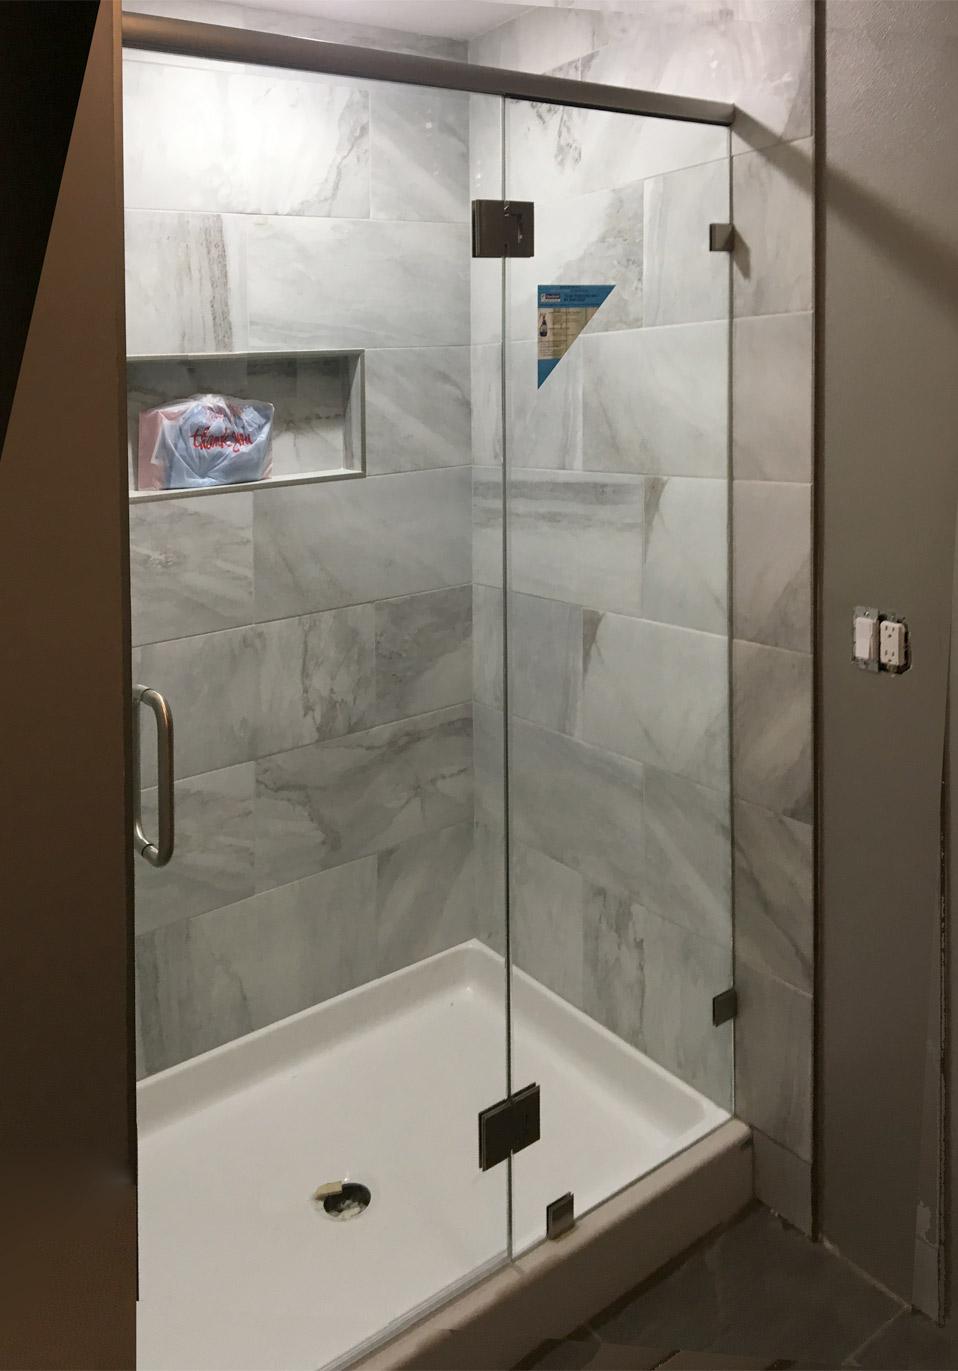 Antique Brushed Nickel Custom Shower Clearshield Shower Glass S Area Glass Wi Shower Glass Panel Mounting Brackets Shower Glass Panel Sizes houzz-03 Shower Glass Panel